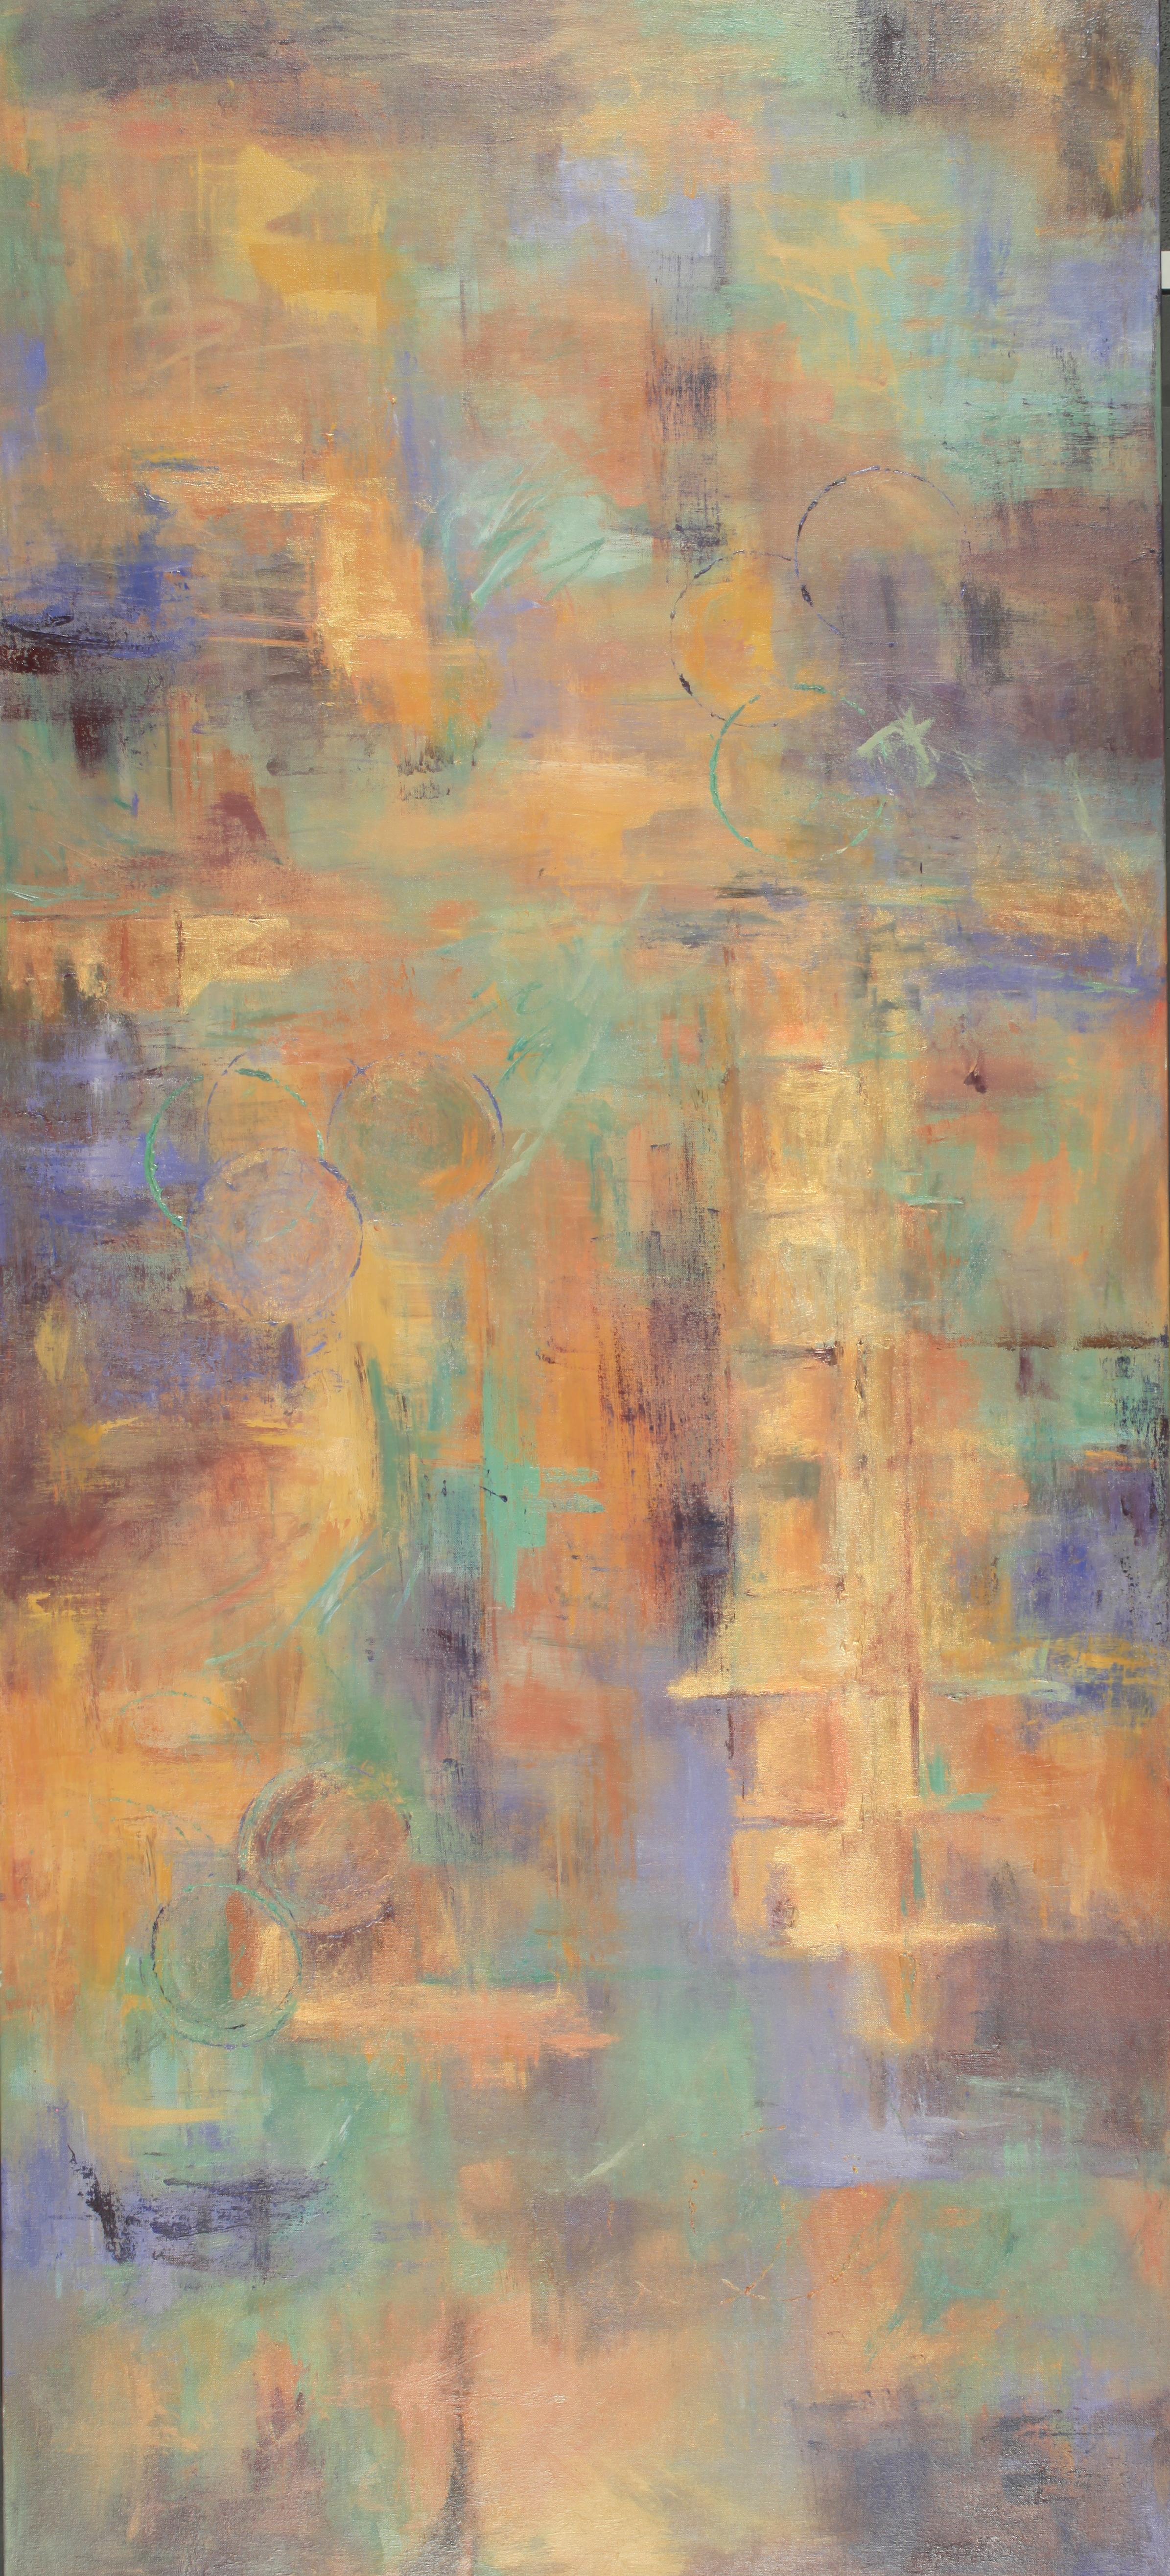 movement-through-color-iii-001